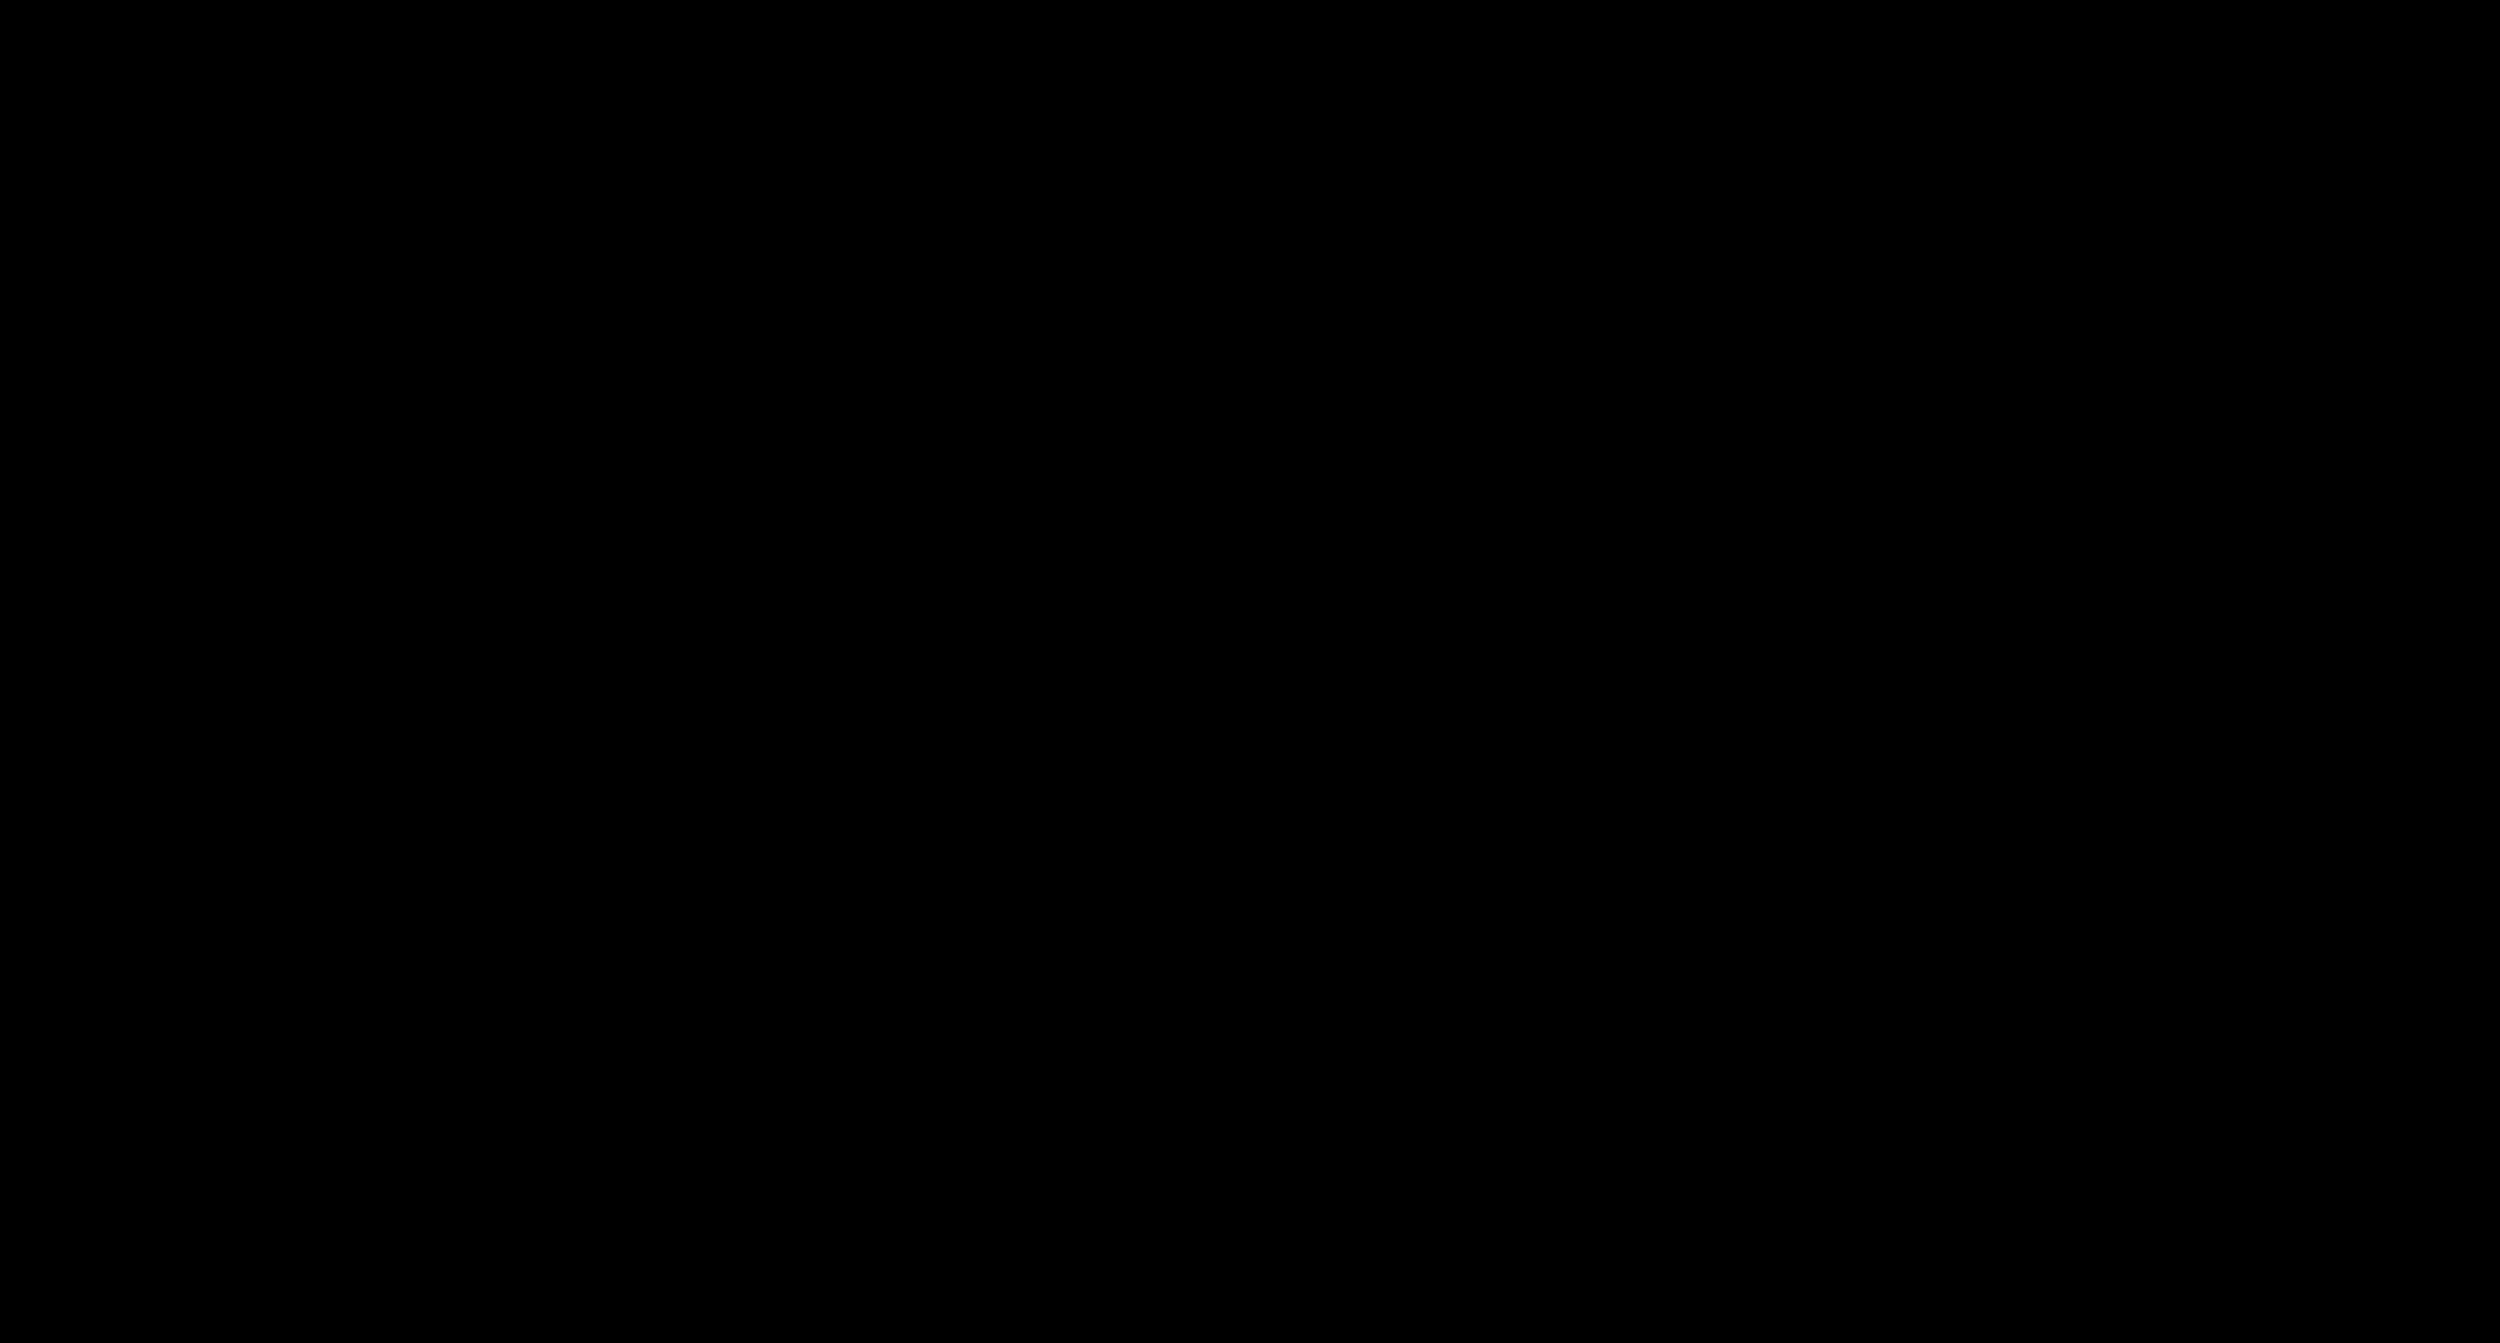 SDAFF_laurel_black_2017.png